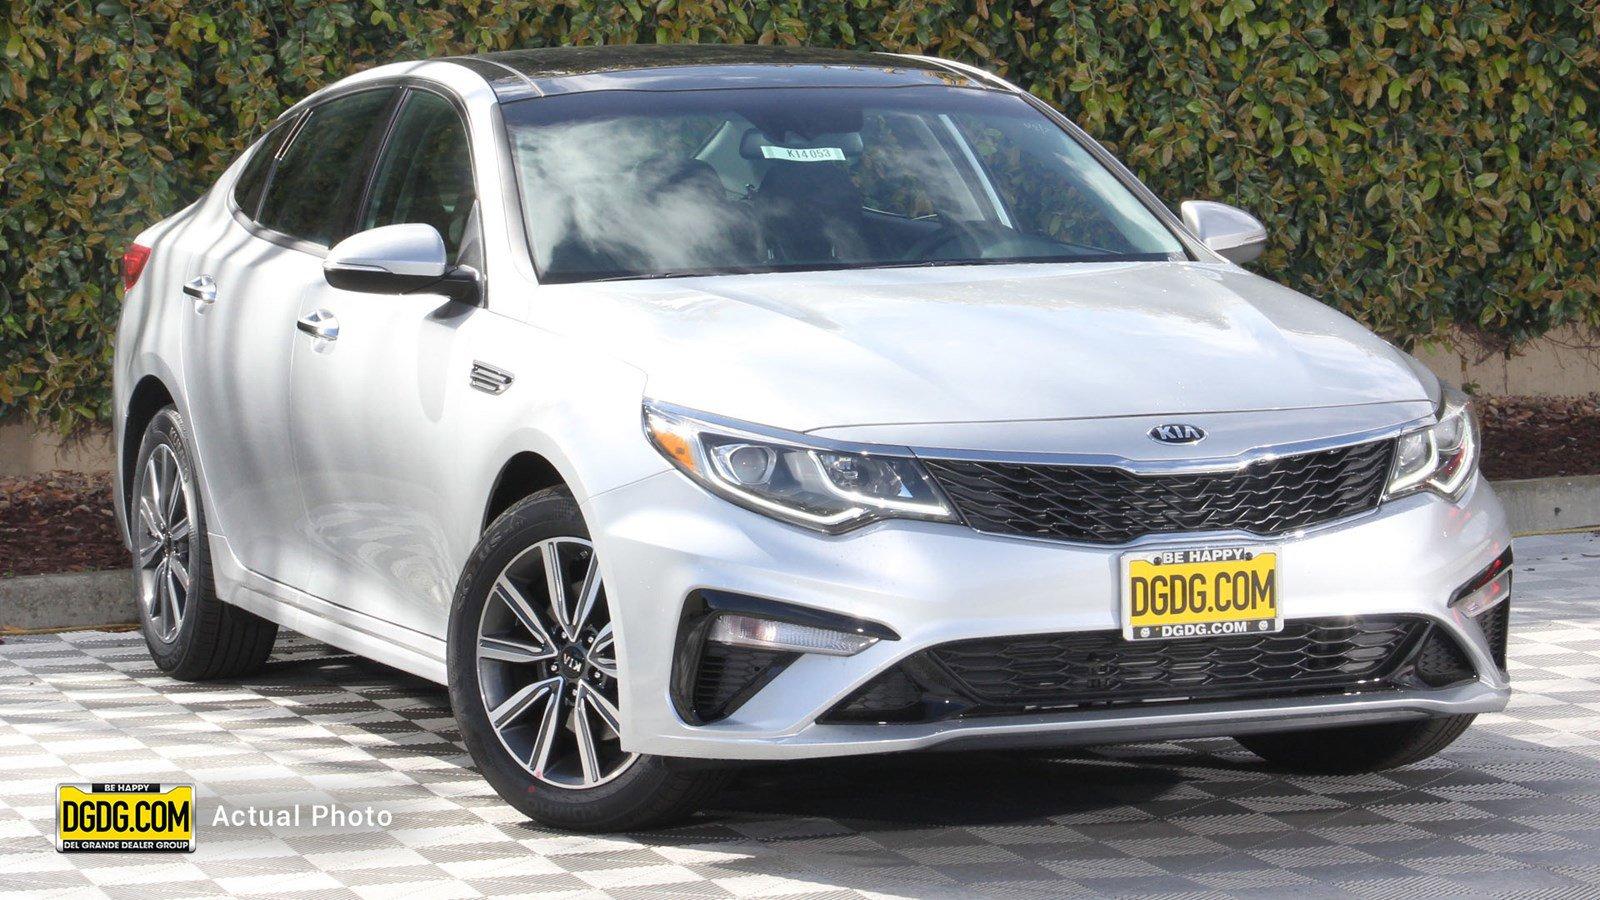 "2019 Kia<br/><span class=""vdp-trim"">Optima LX FWD 4dr Car</span>"